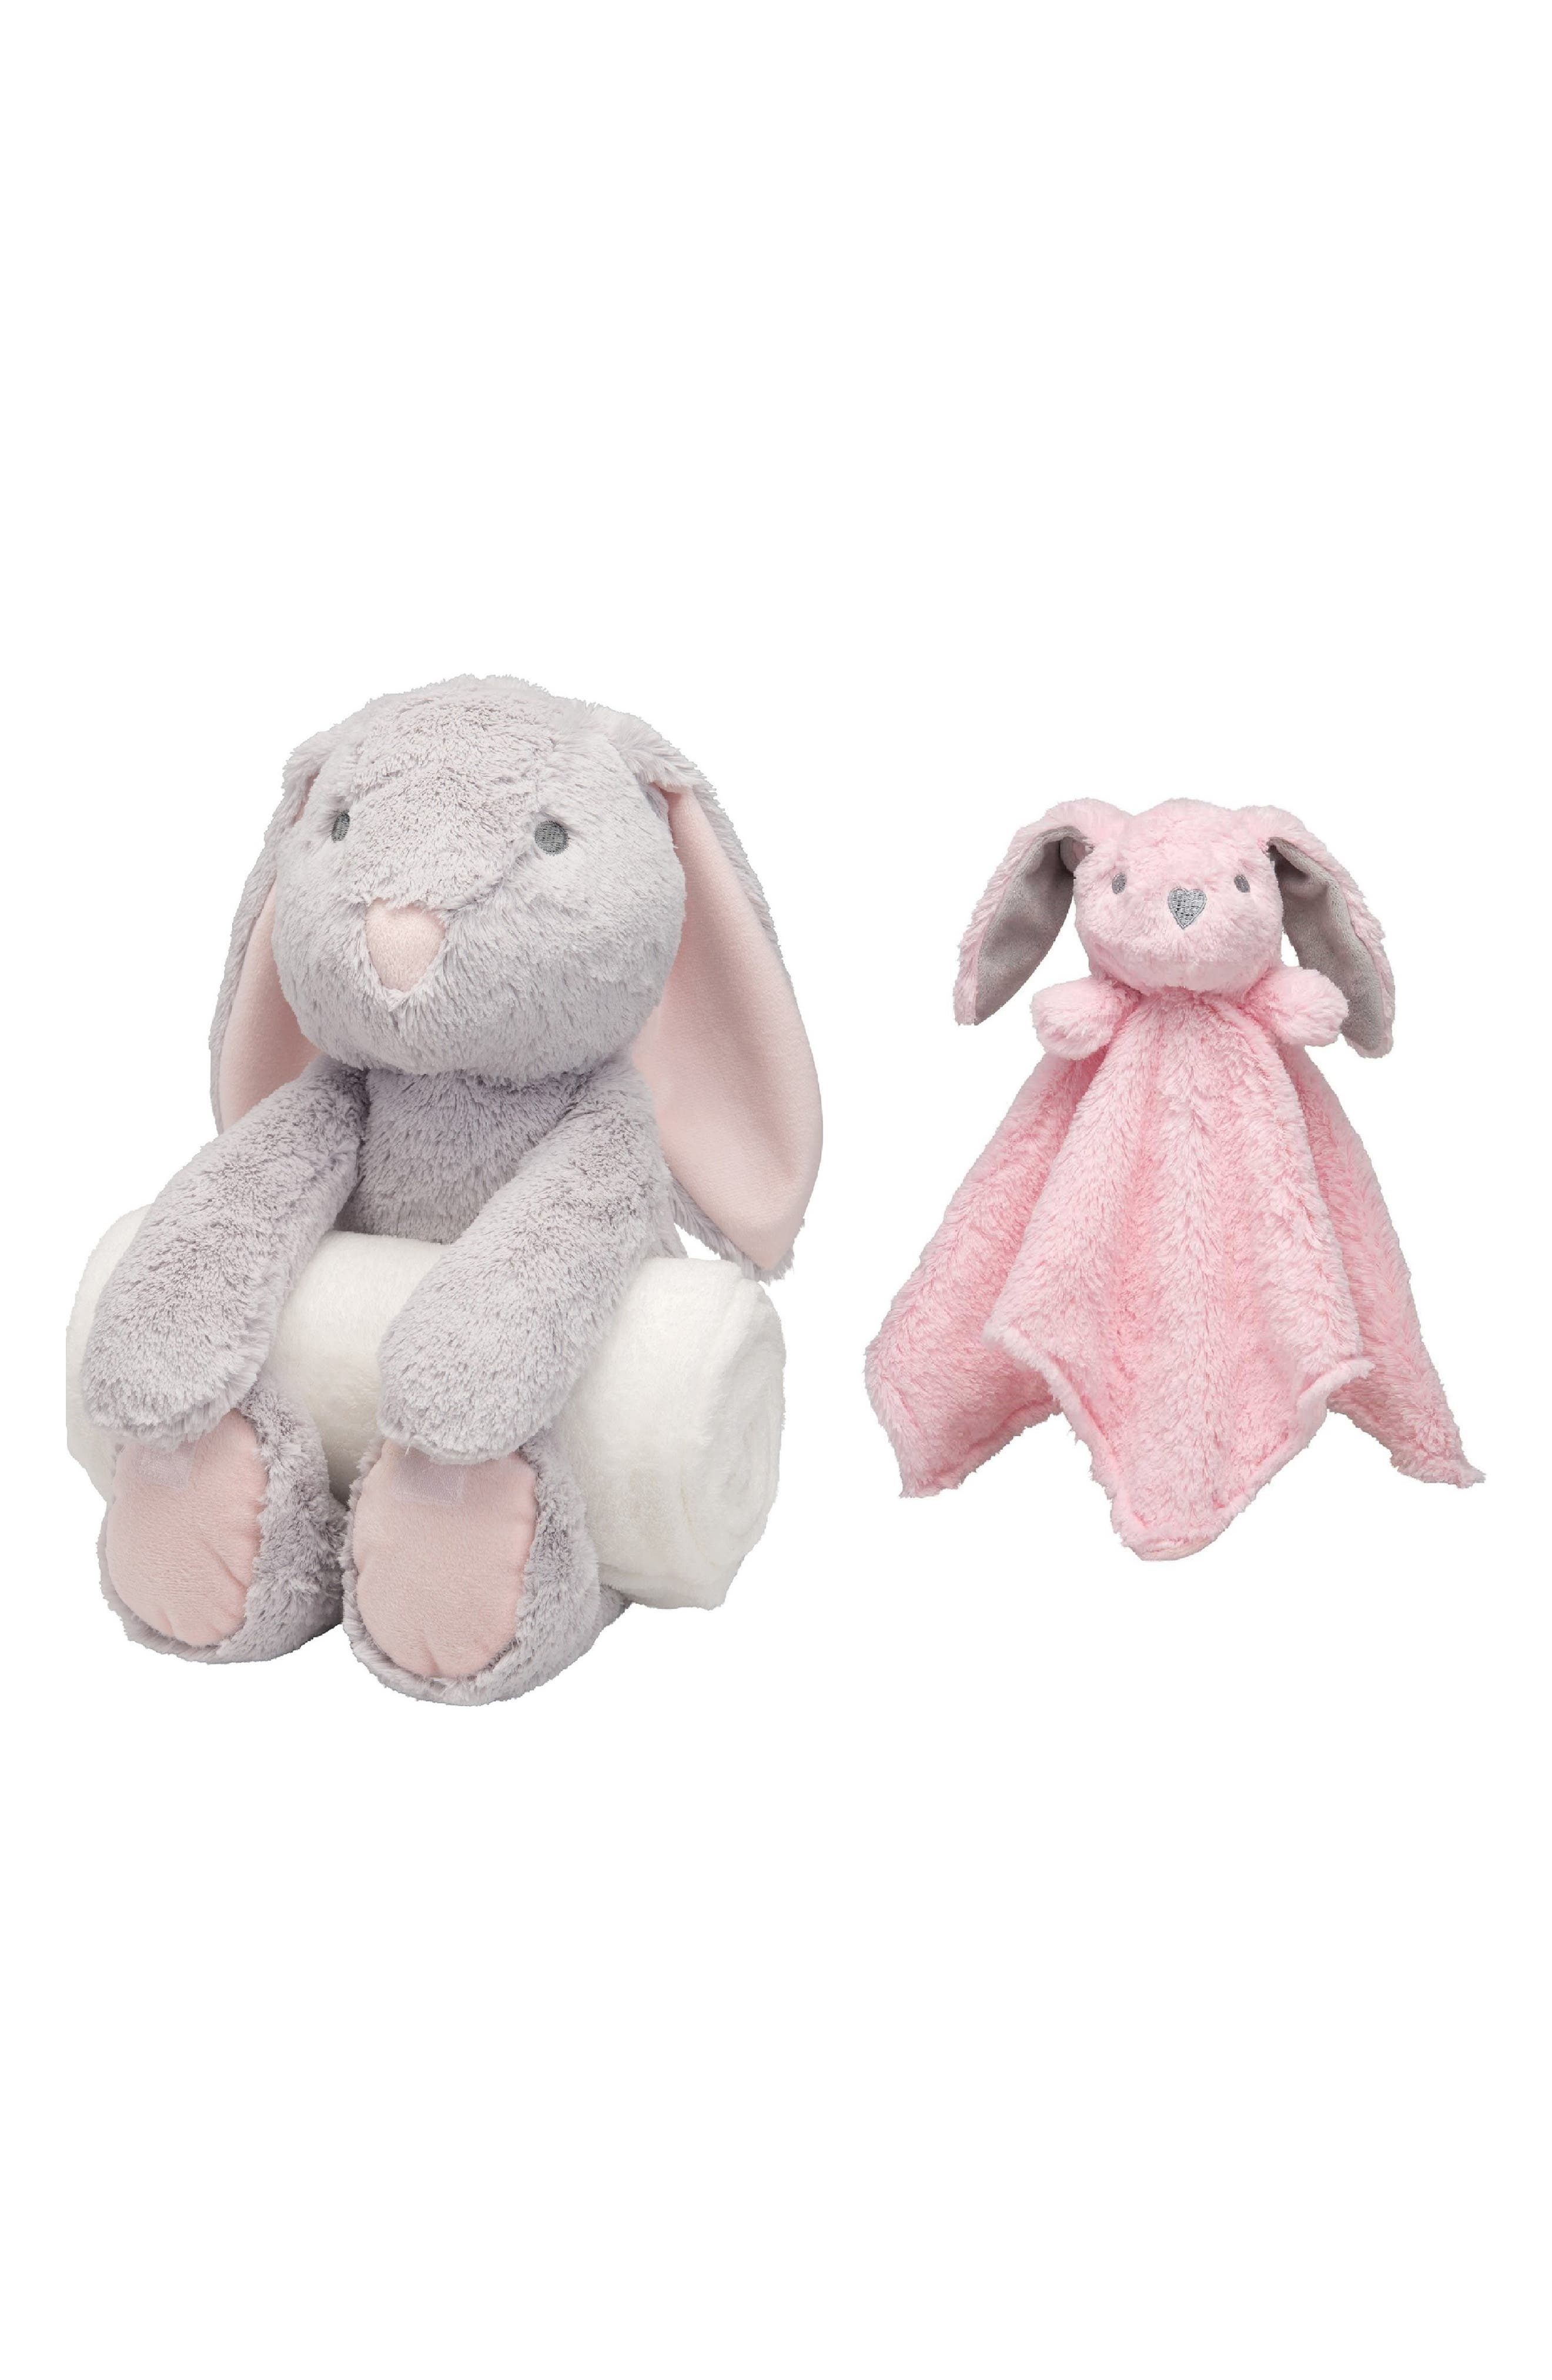 ELEGANT BABY, Bunny Bedtime Huggie Stuffed Animal, Blanket & Security Blanket Set, Main thumbnail 1, color, PINK